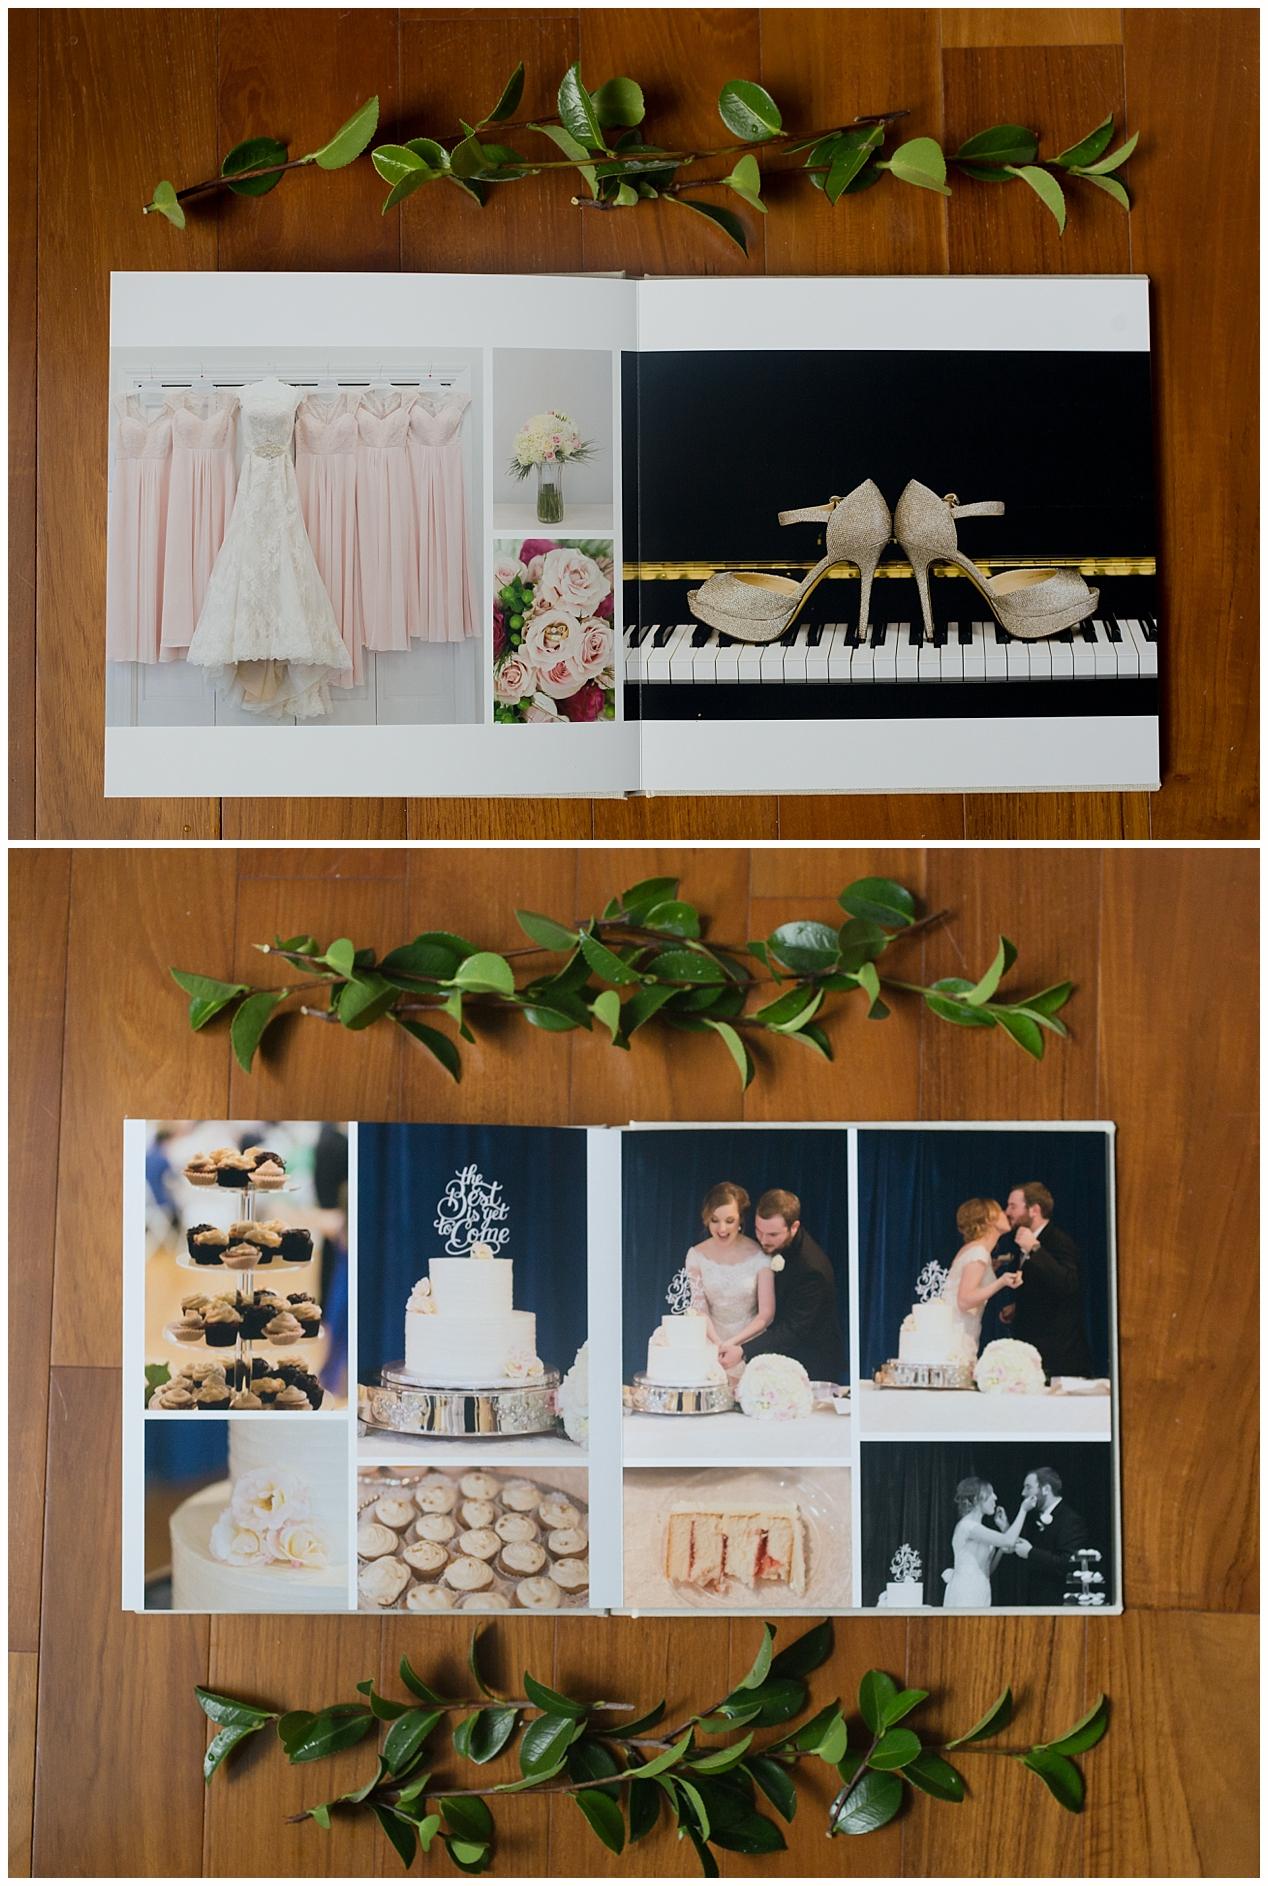 Ocean Springs, MS wedding photographer - details in layflat wedding album